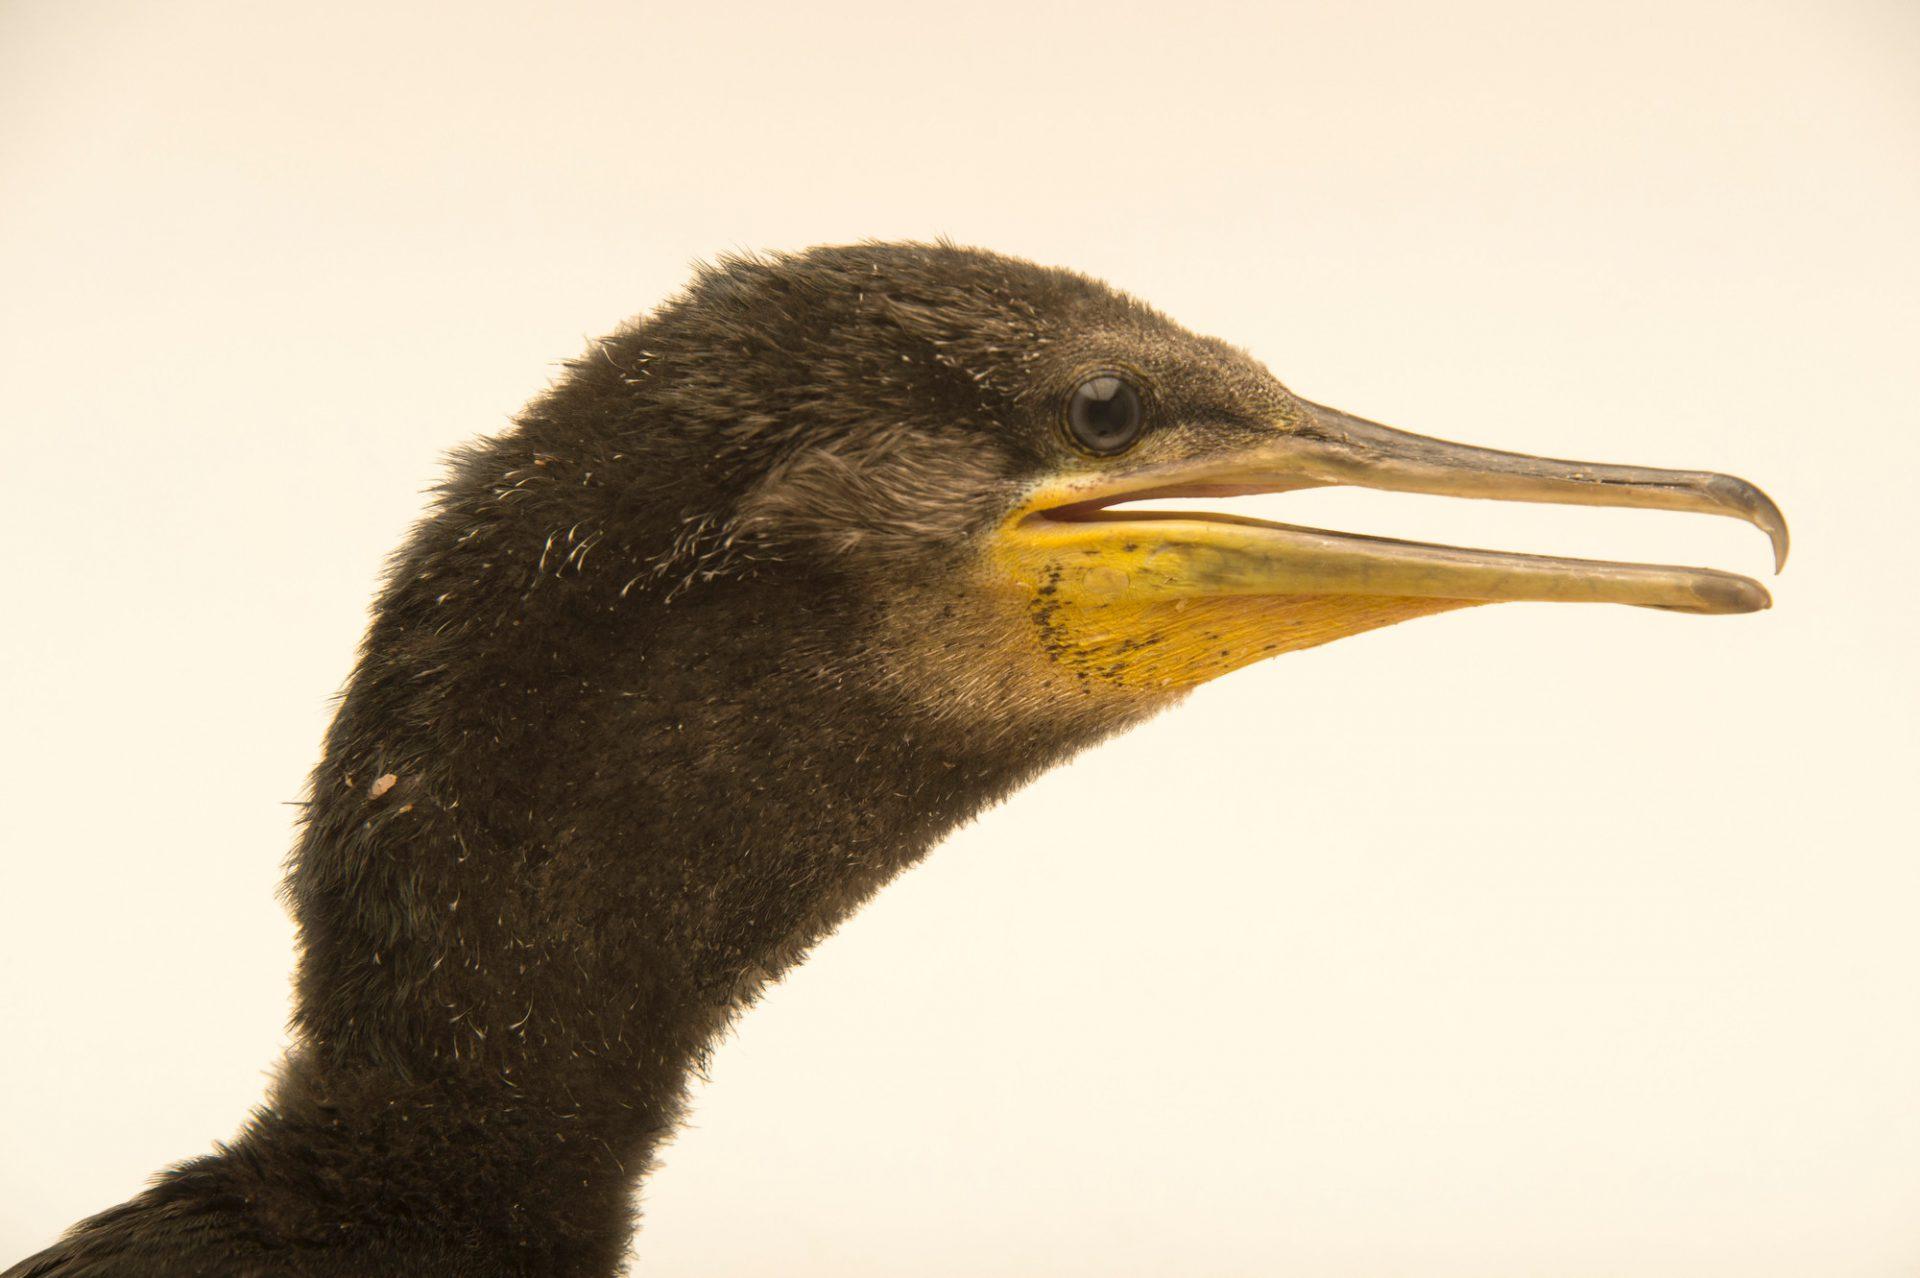 Photo: Little cormorant (Phalacrocorax niger) at Kamla Nehru Zoological Garden, Ahmedabad, India.